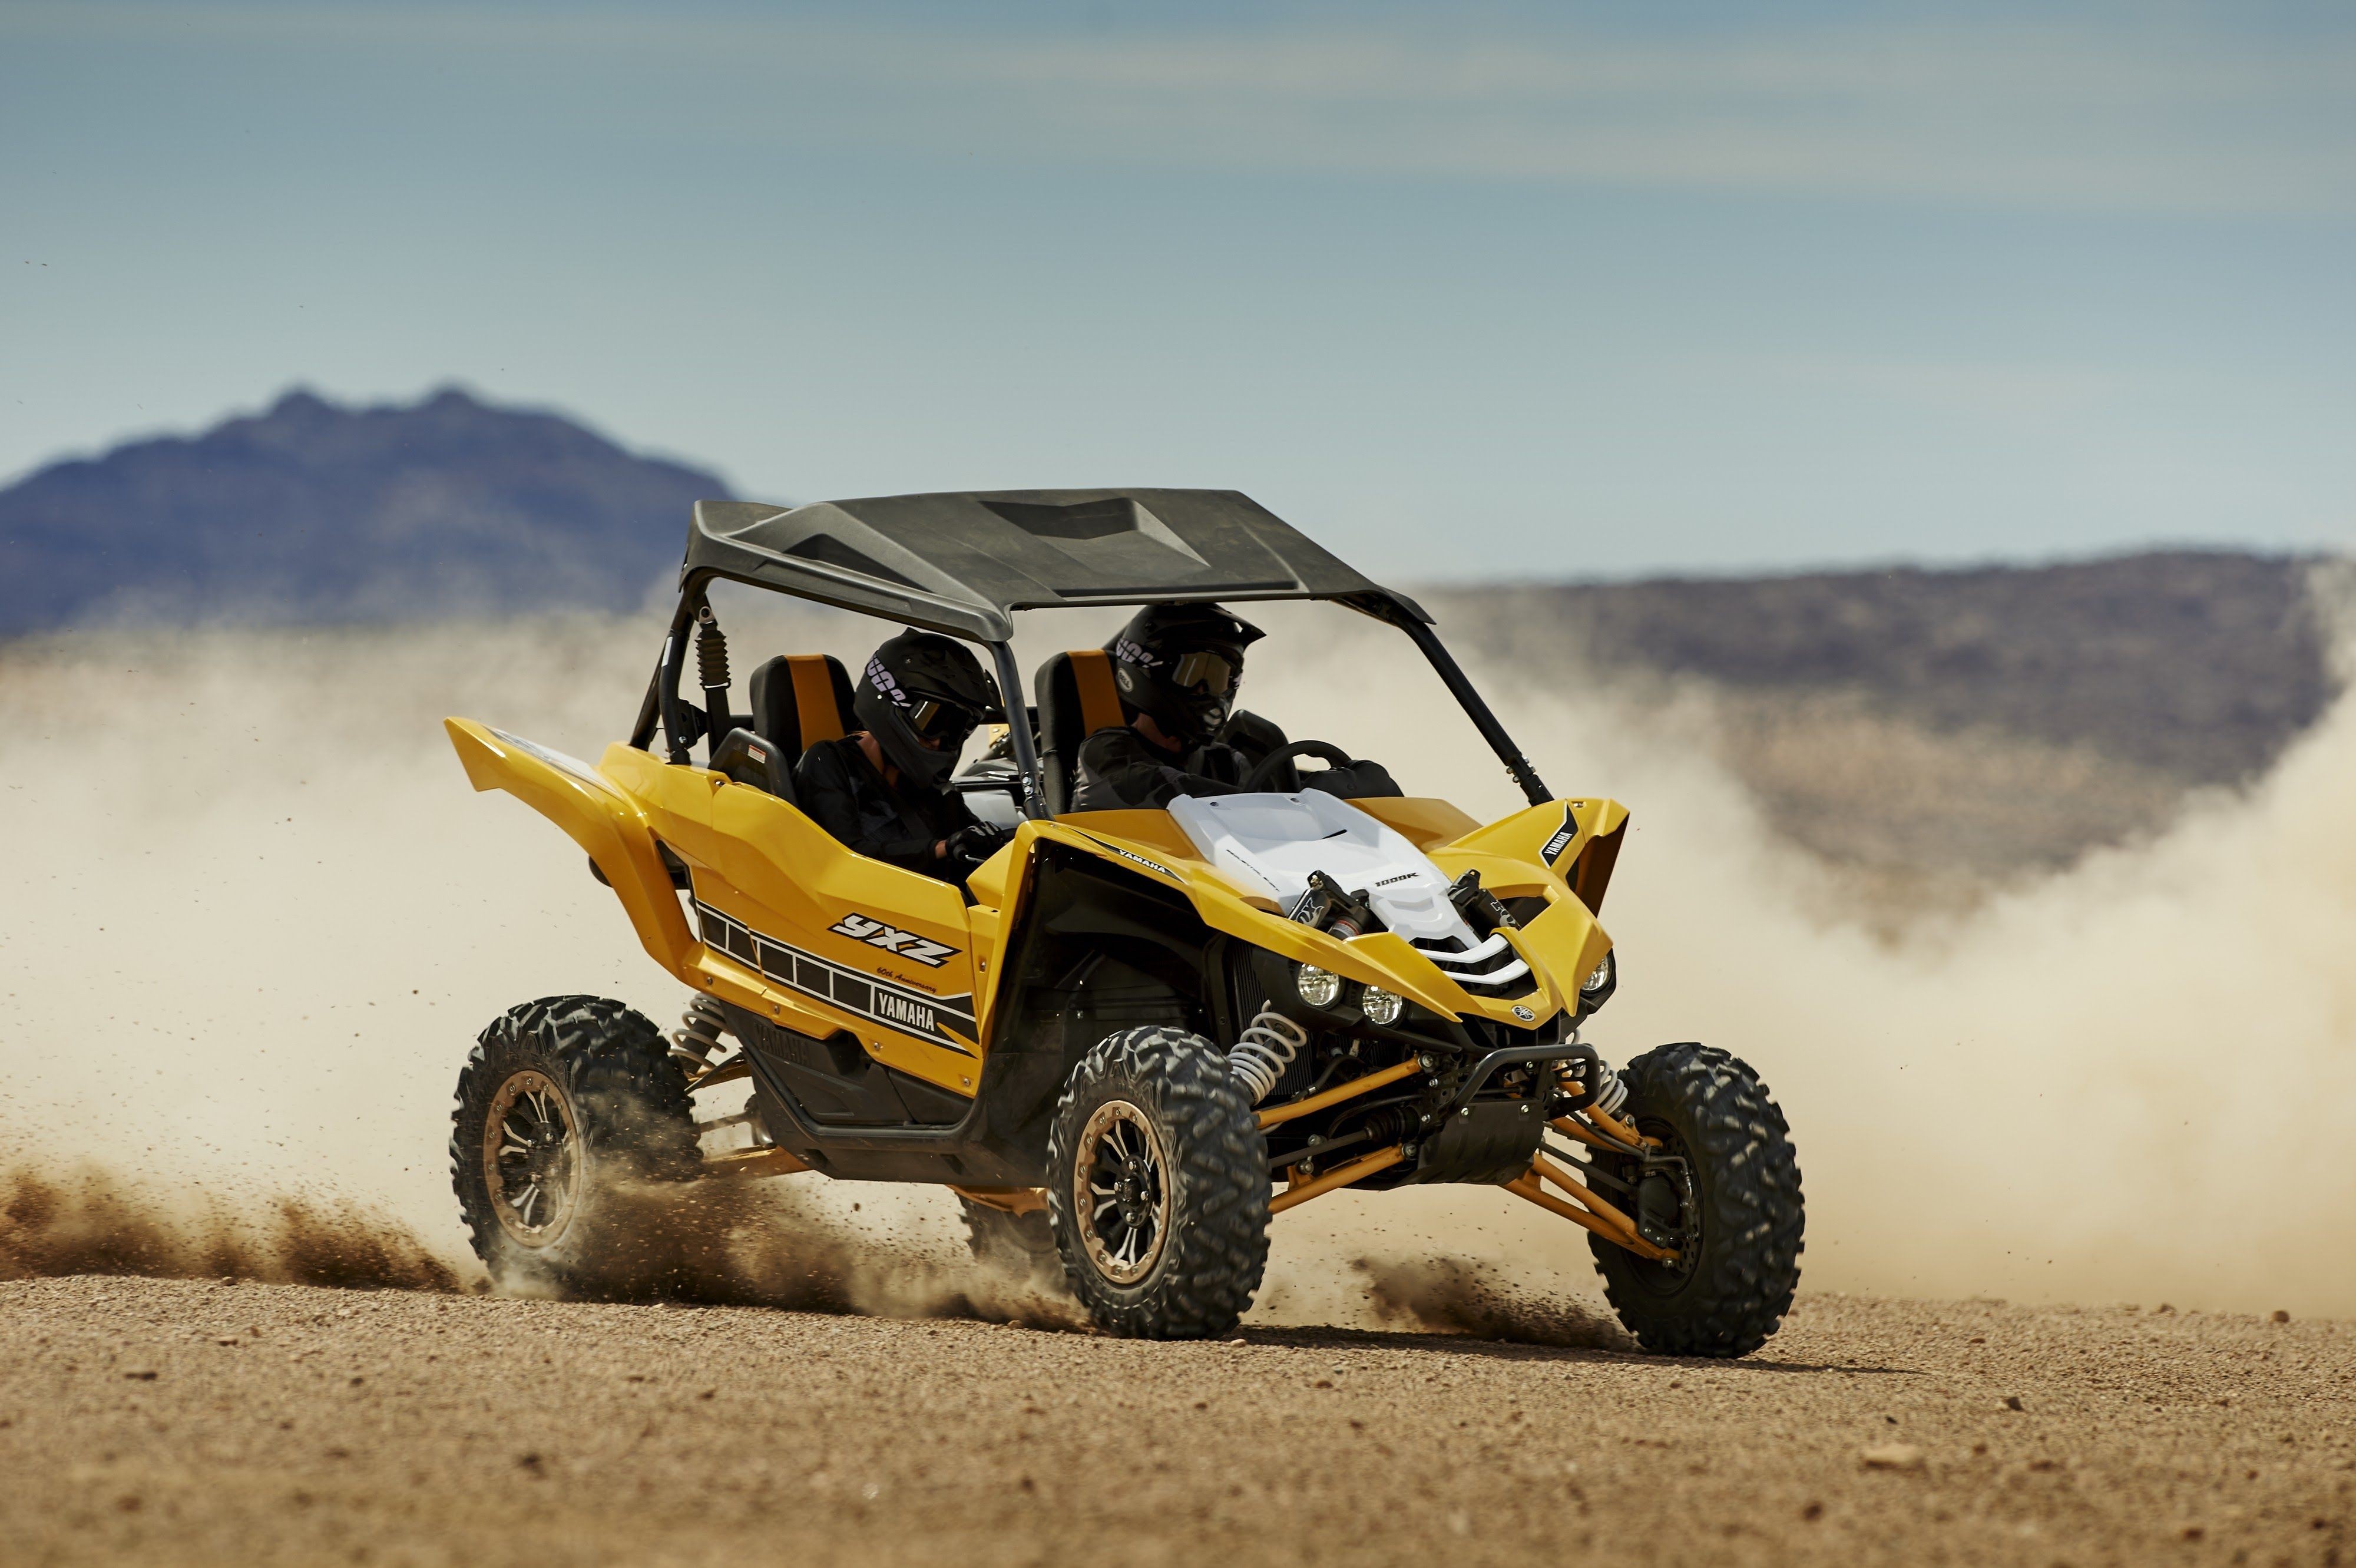 Yamaha YXZ 1000R Jumps, Drifts And Launches | randomn stuff I like